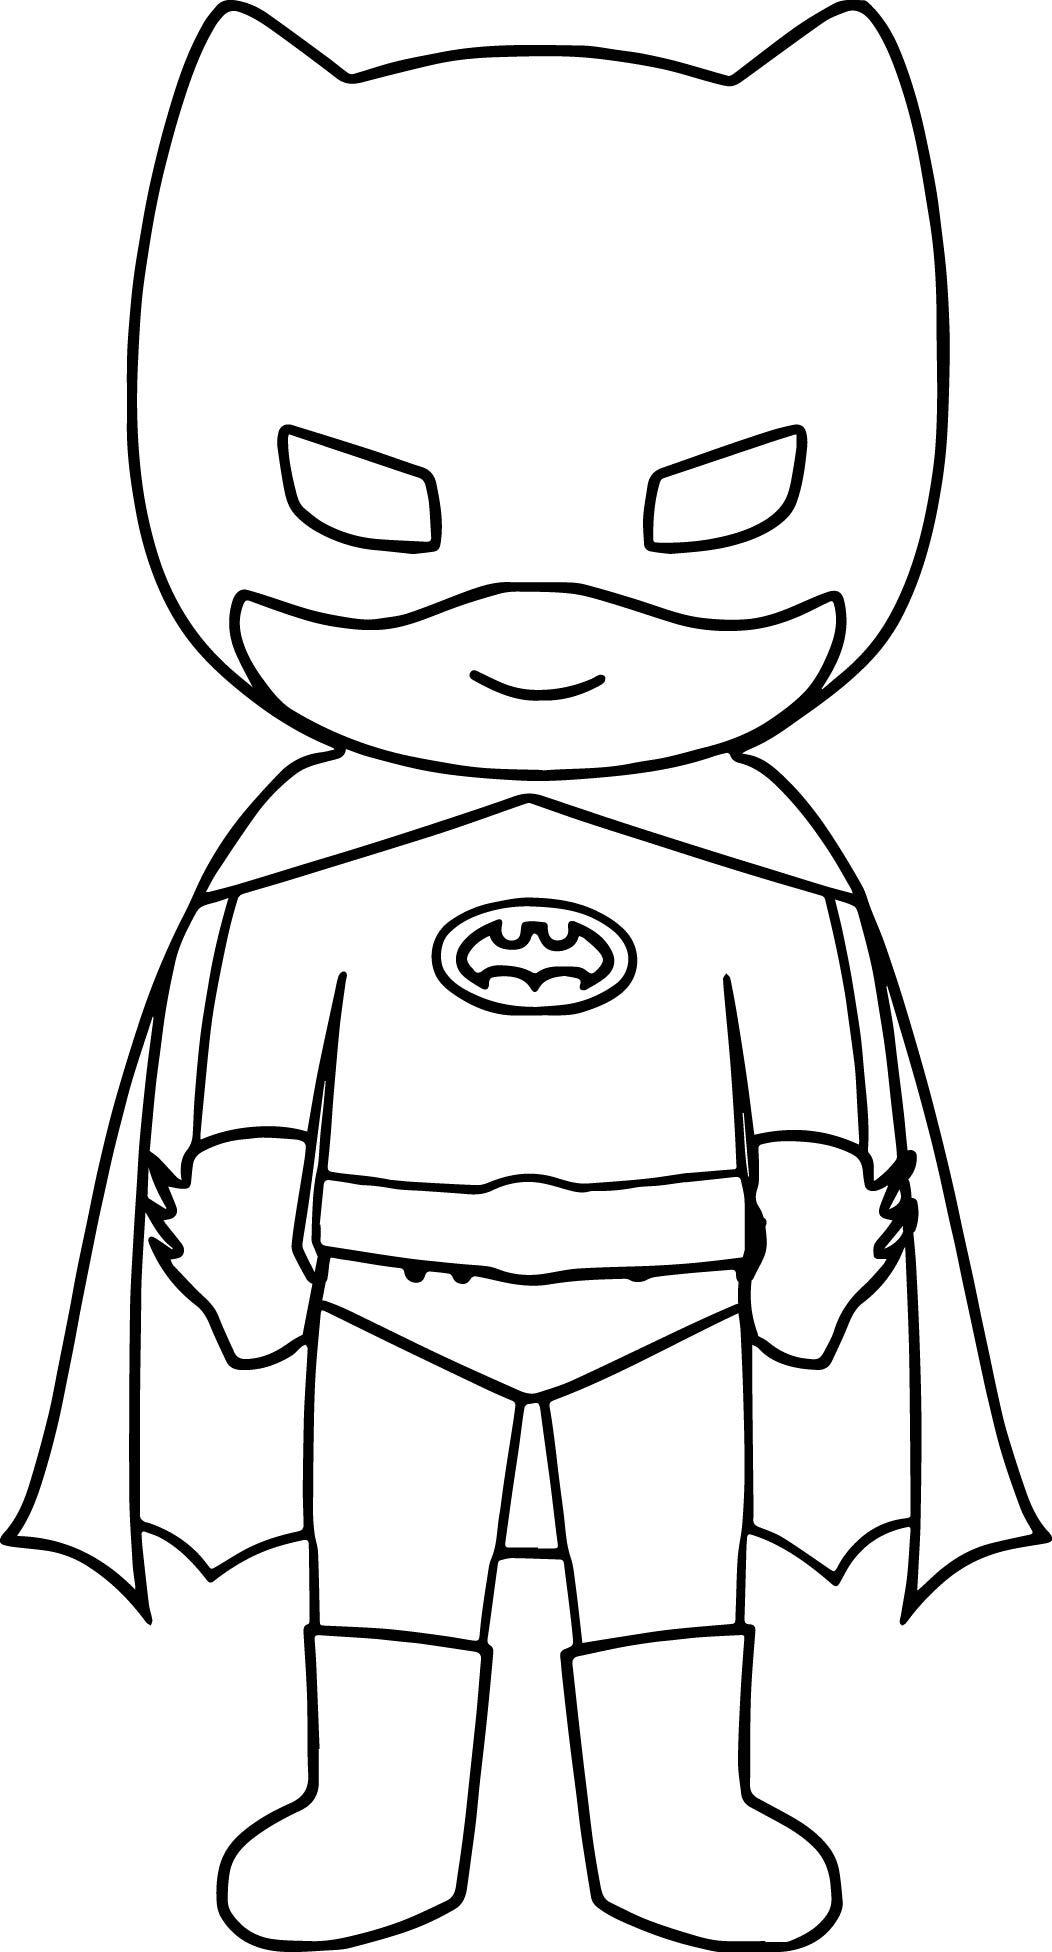 Cool Bat Superhero Kids Coloring Page | Education